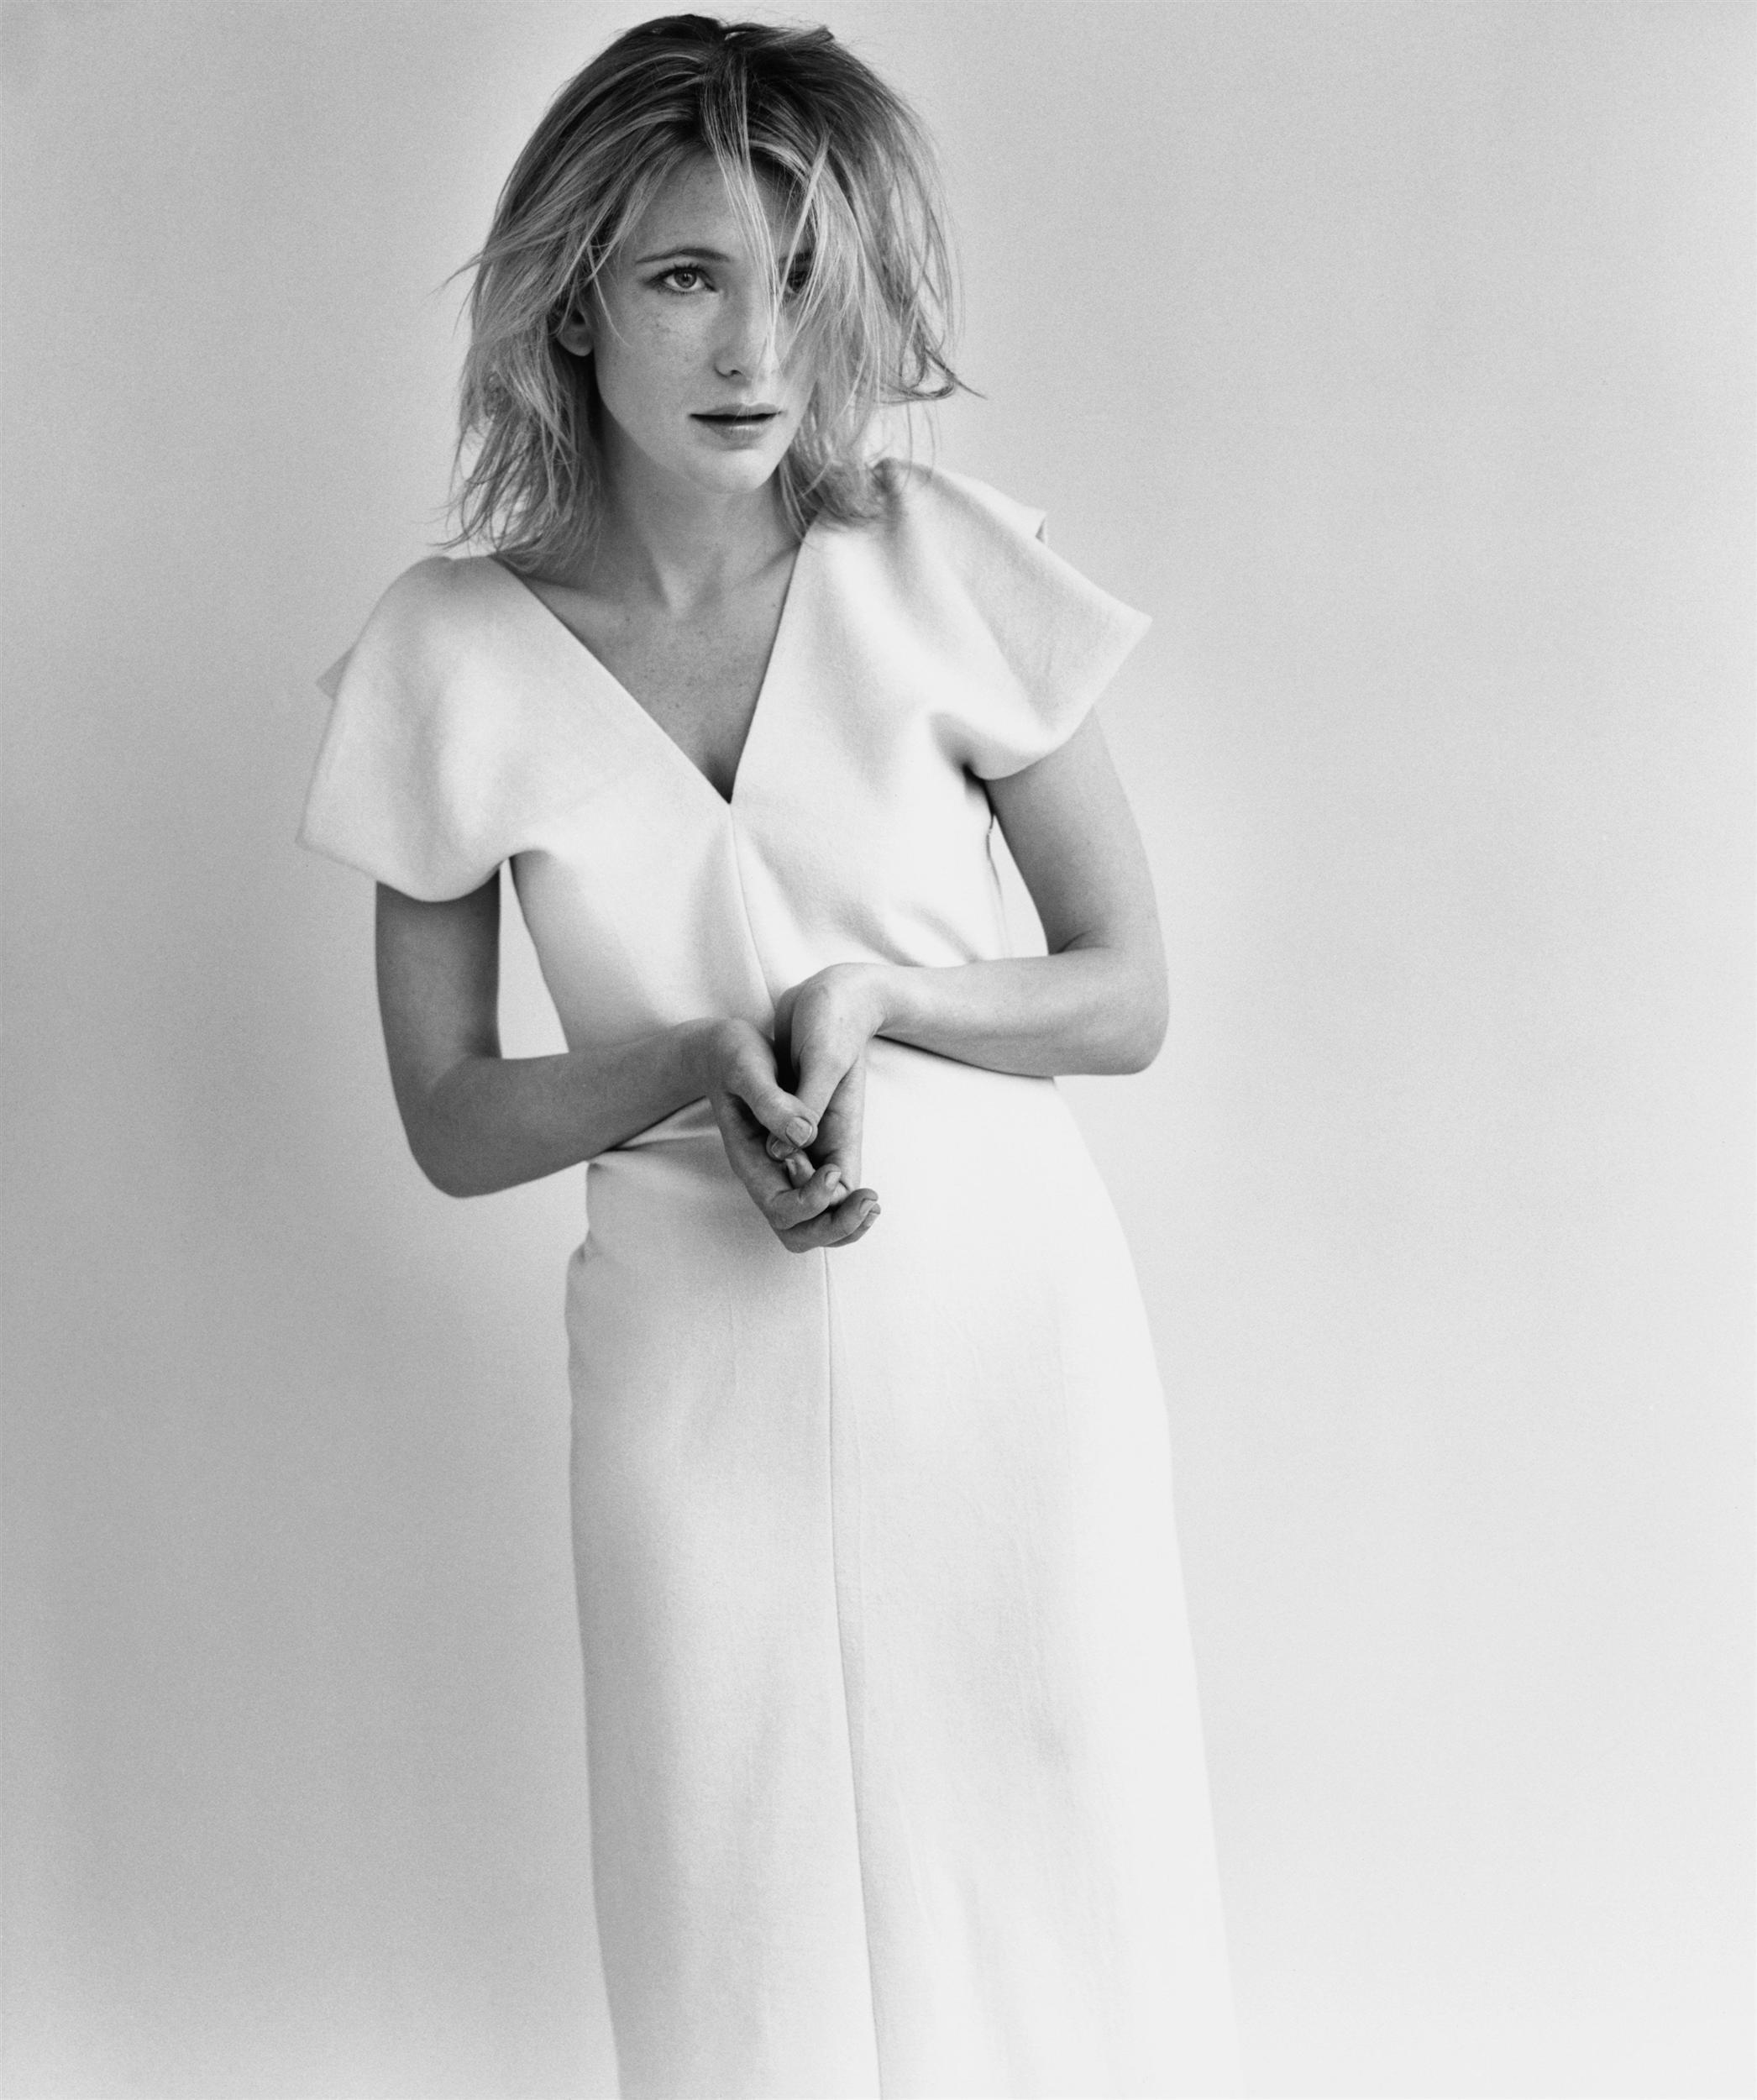 fotos Cate Blanchett desnuda